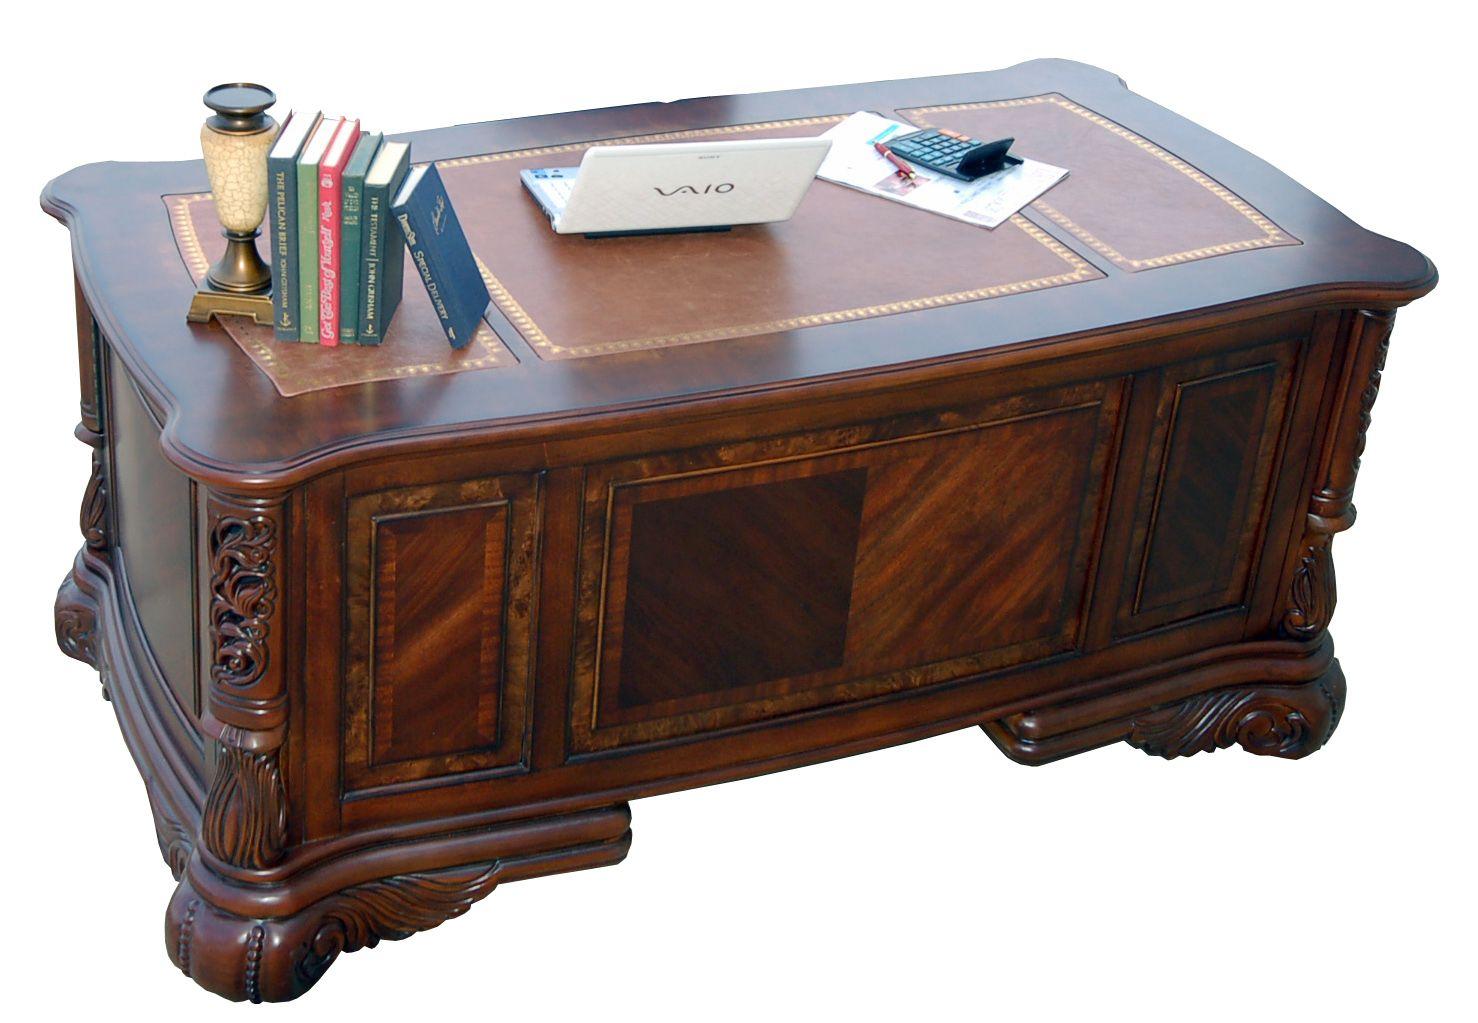 Impressive Mahogany Office Desk black walnut executive suite I Love The Look Of The Desk Top I Like The Ornate Wood Carvings I Do Not Like The Protruding Corners